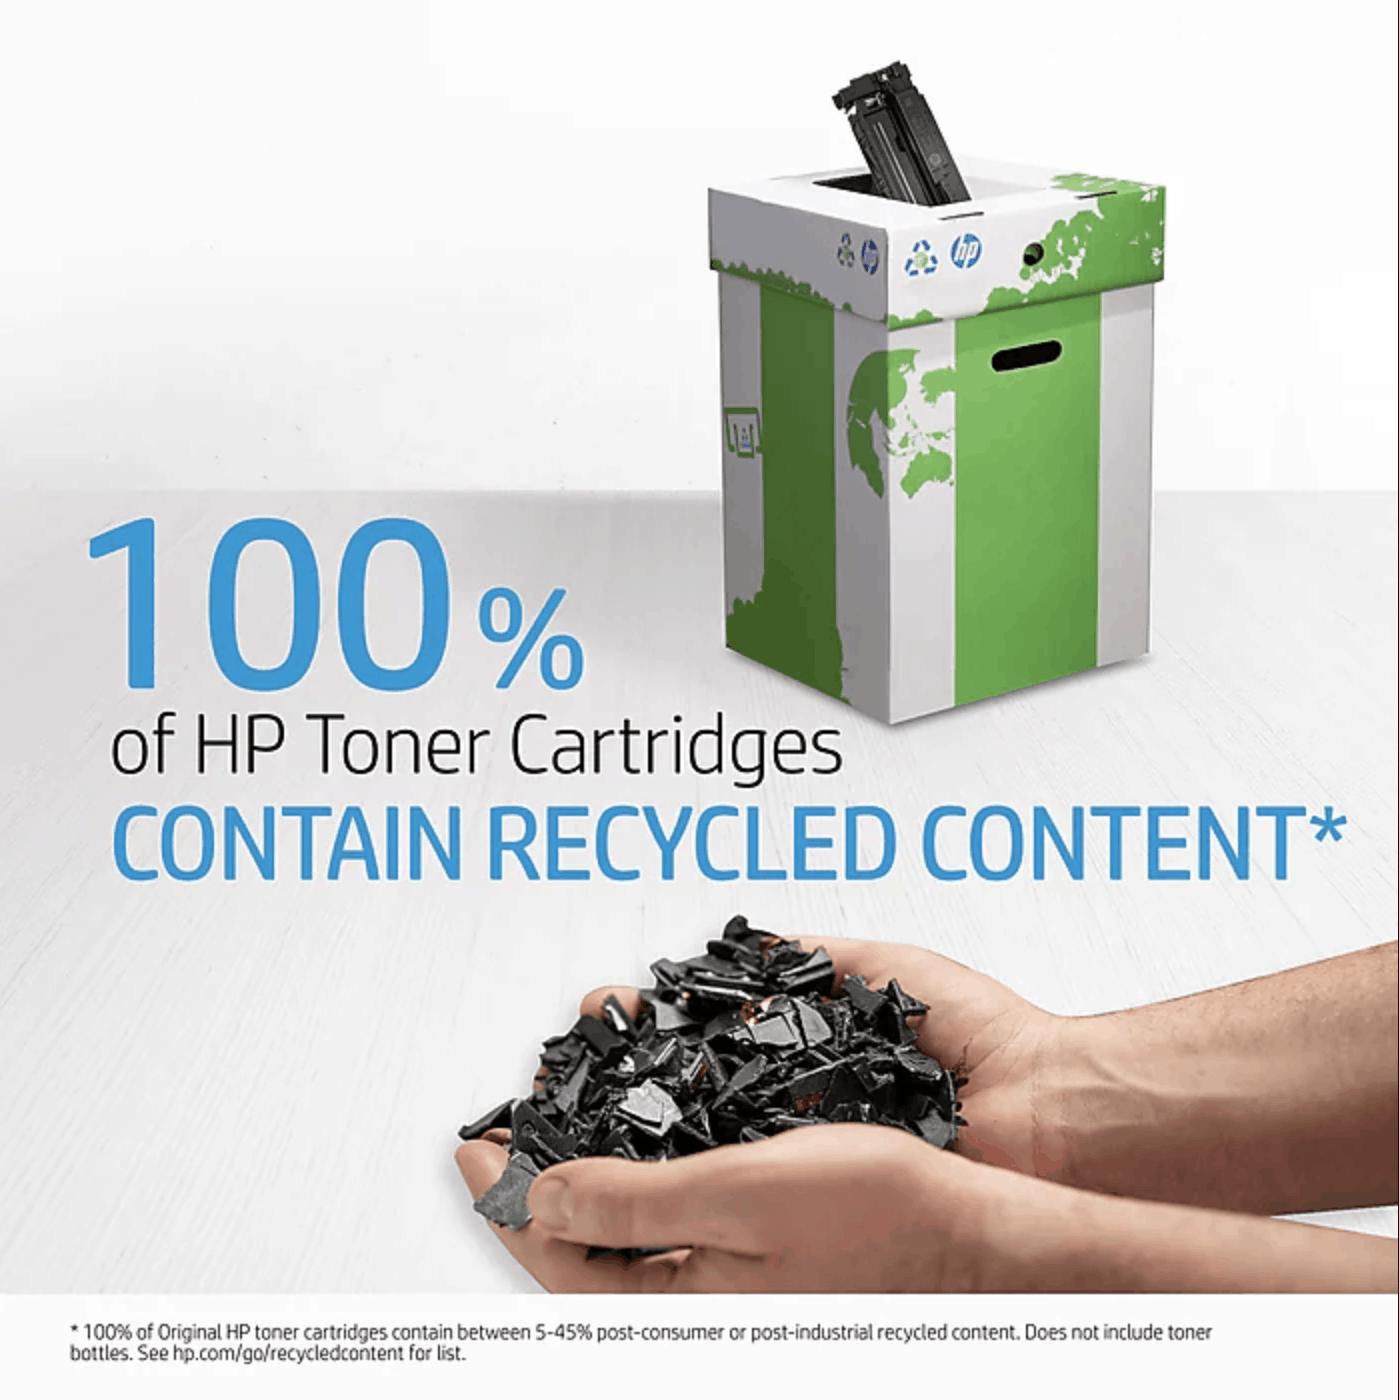 HP Toner Cartridges Recycling Rewards